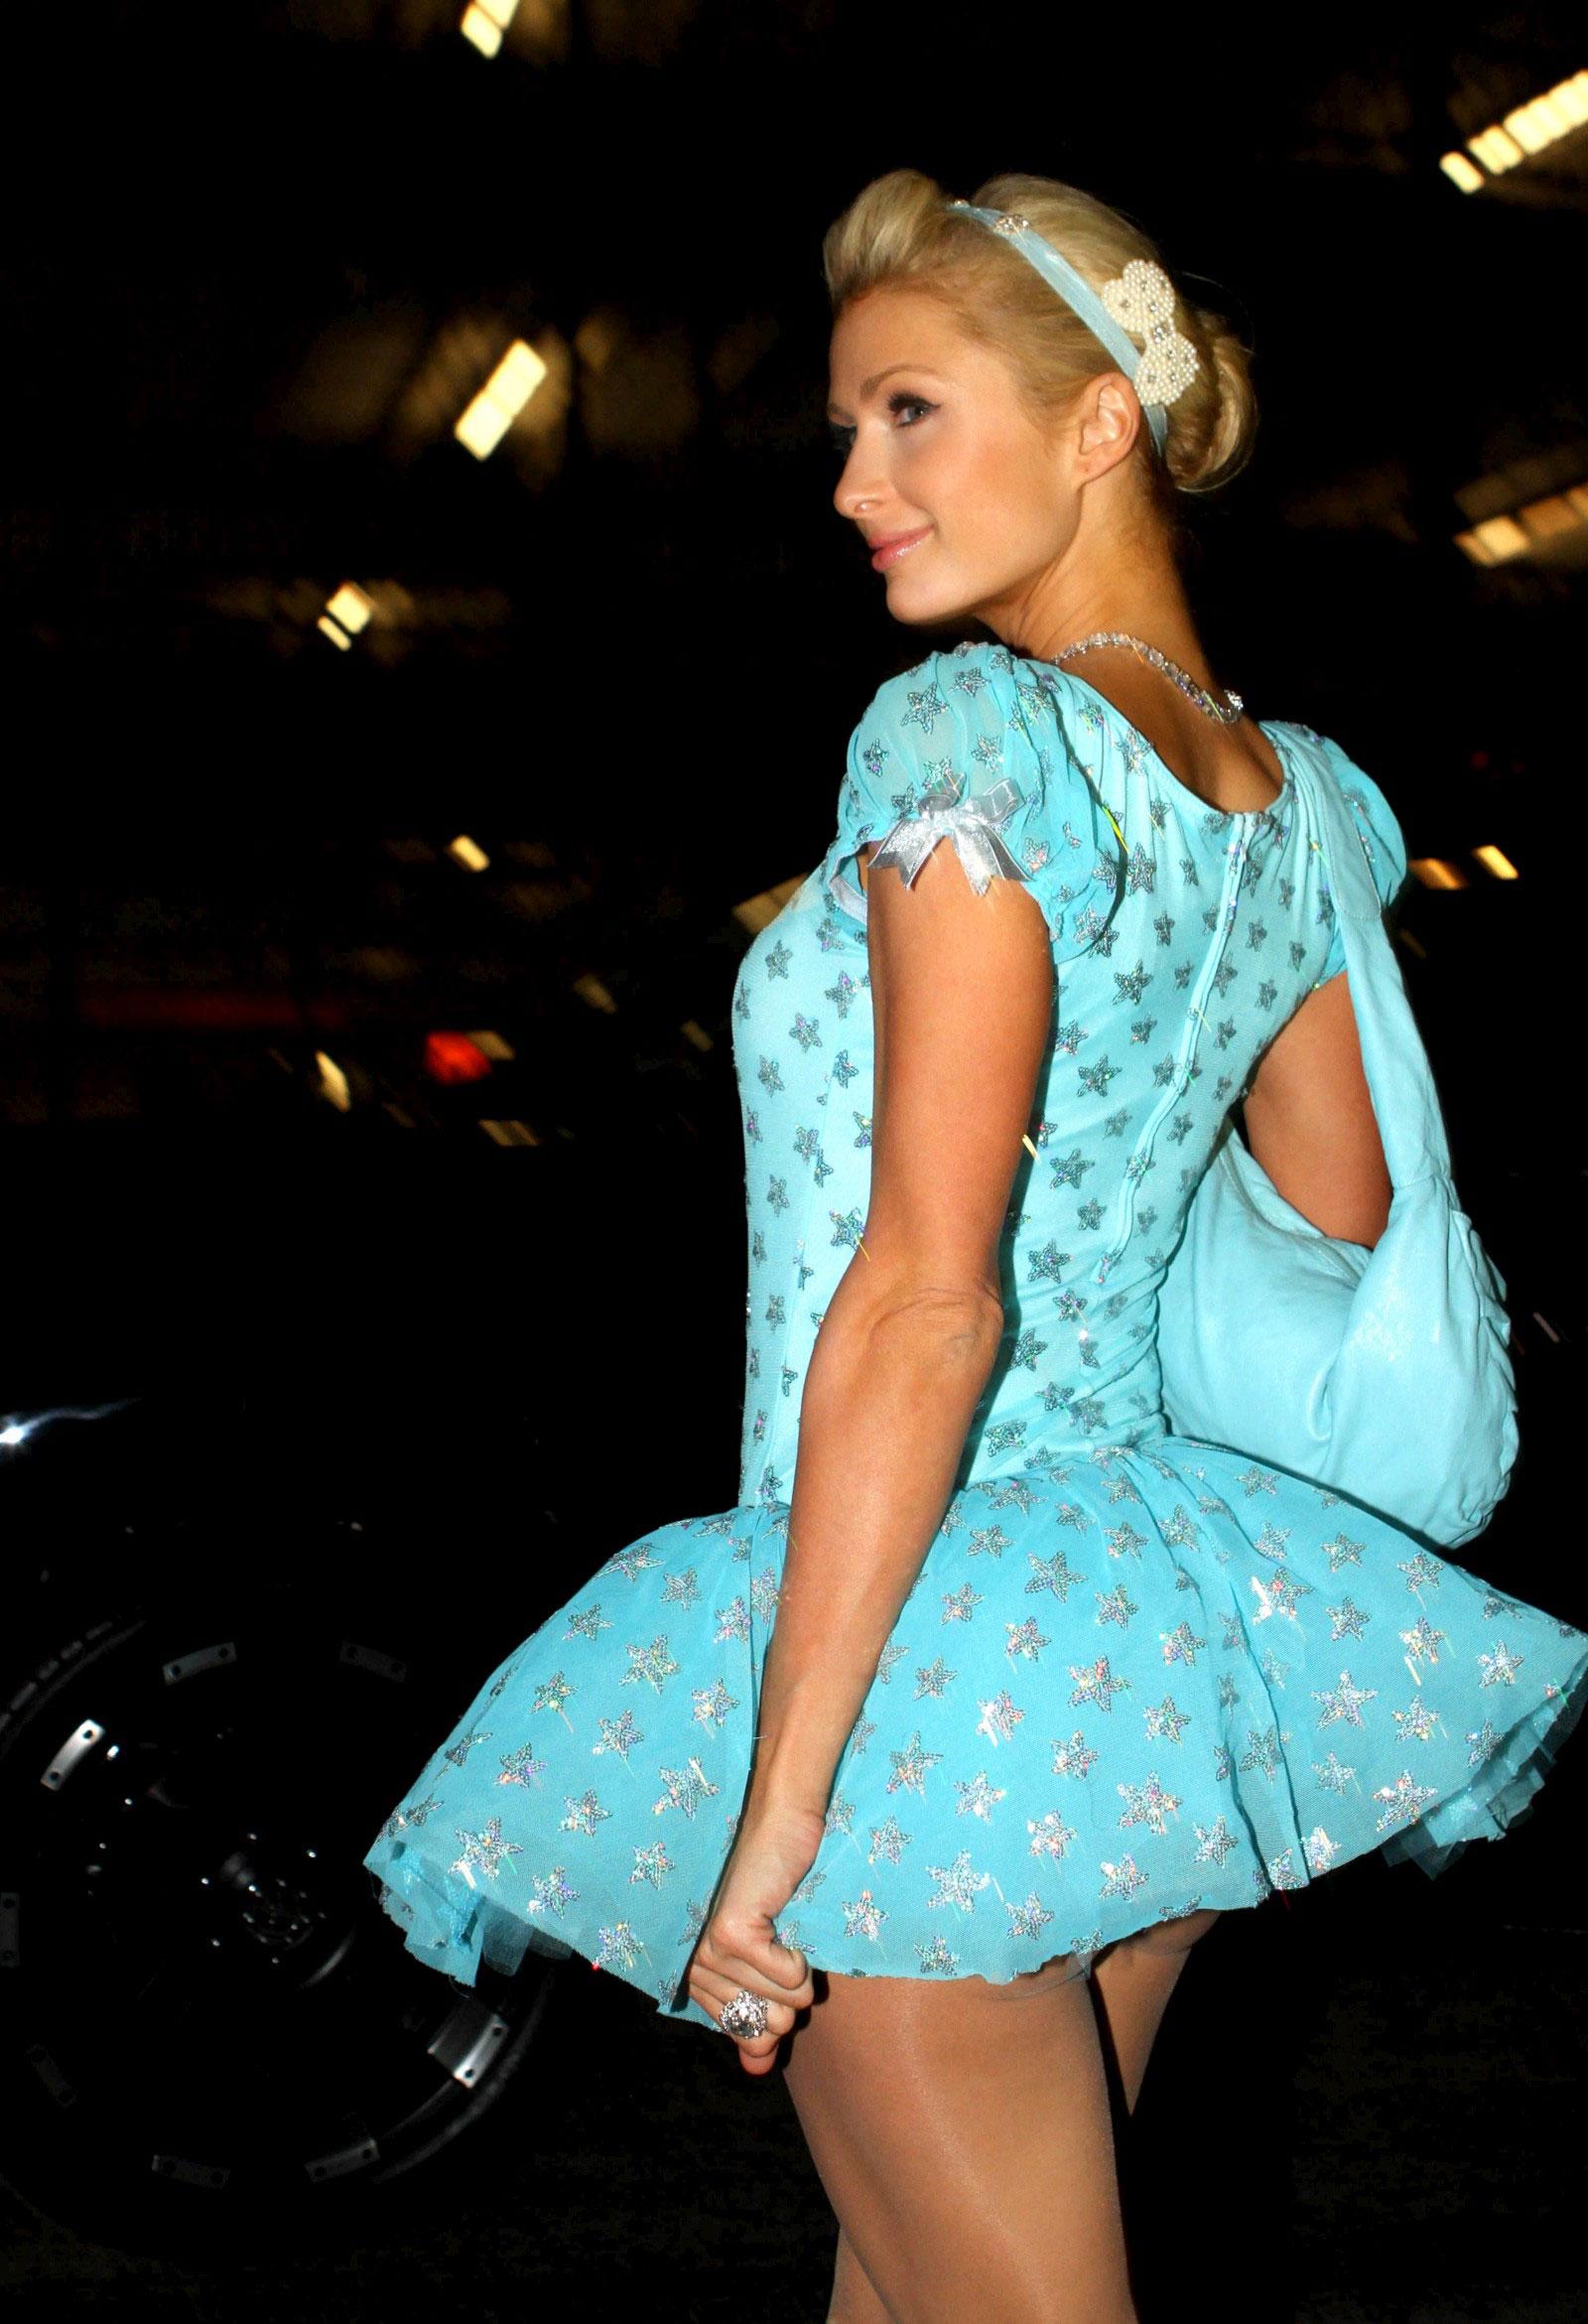 Paris Hilton at Halloween Party - HawtCelebs